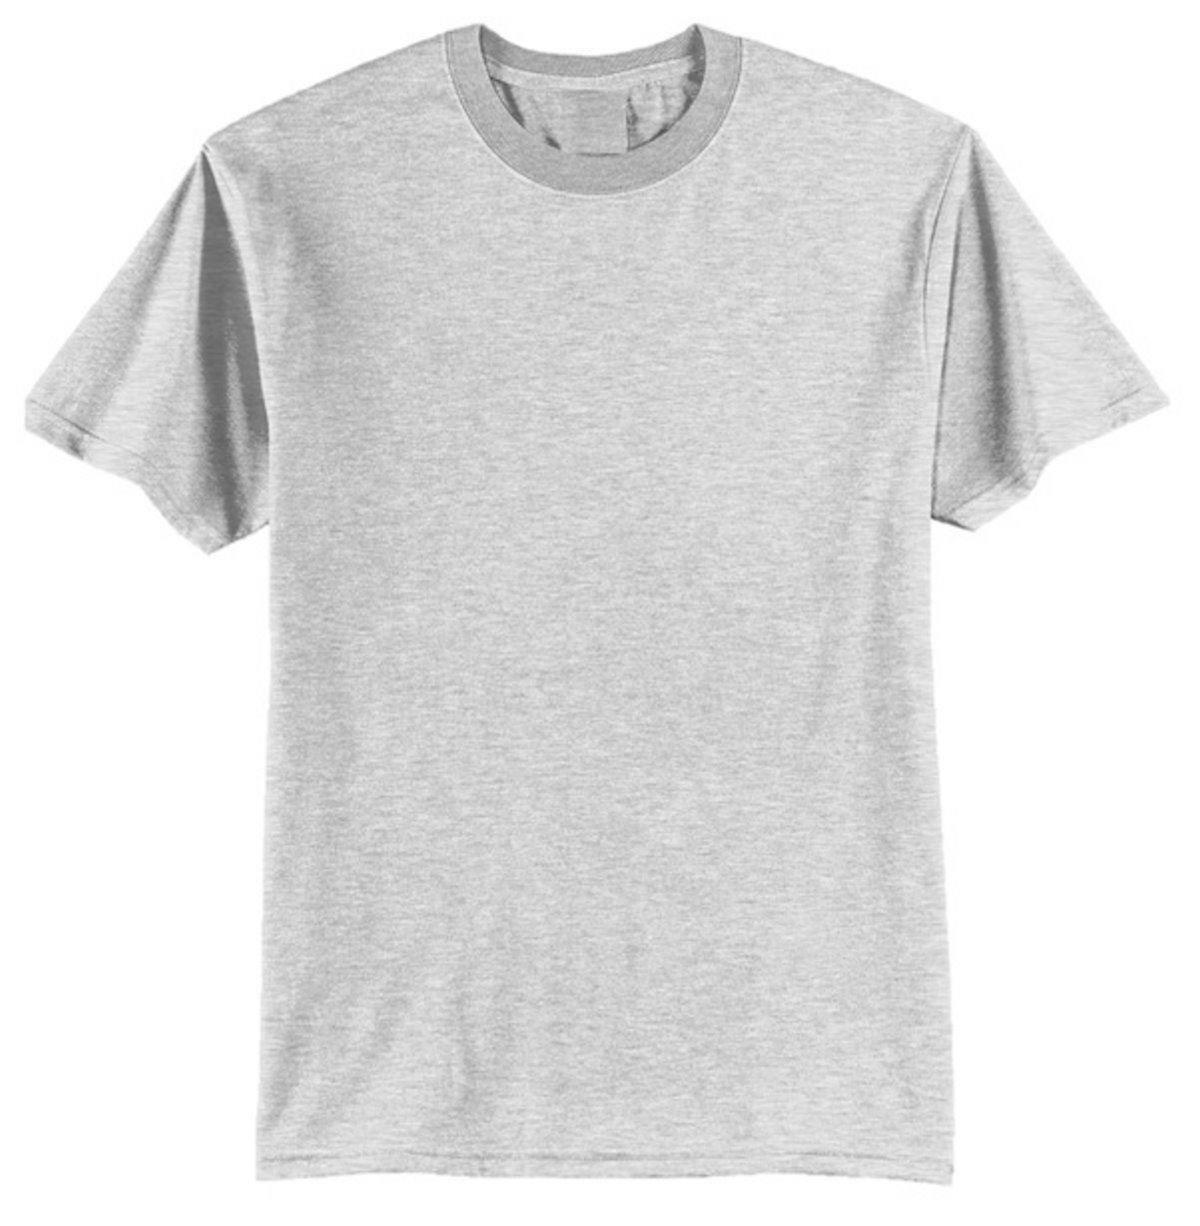 Big mens t shirt tee polo king size 3xl 4xl 5xl 6xl twin for Mens 3xl t shirts